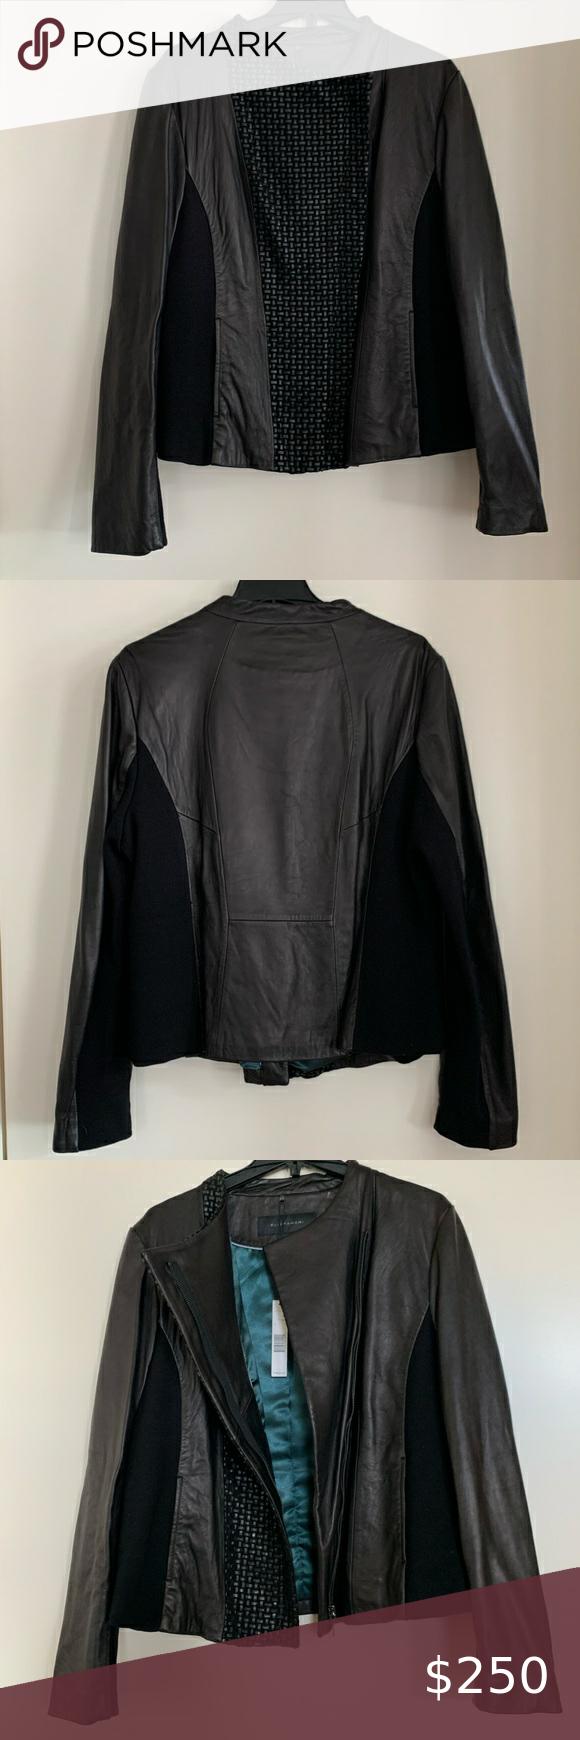 Ellie Tahari Leather Jacket Nwt In 2020 Leather Jacket Elie Tahari Jacket Jackets [ 1740 x 580 Pixel ]